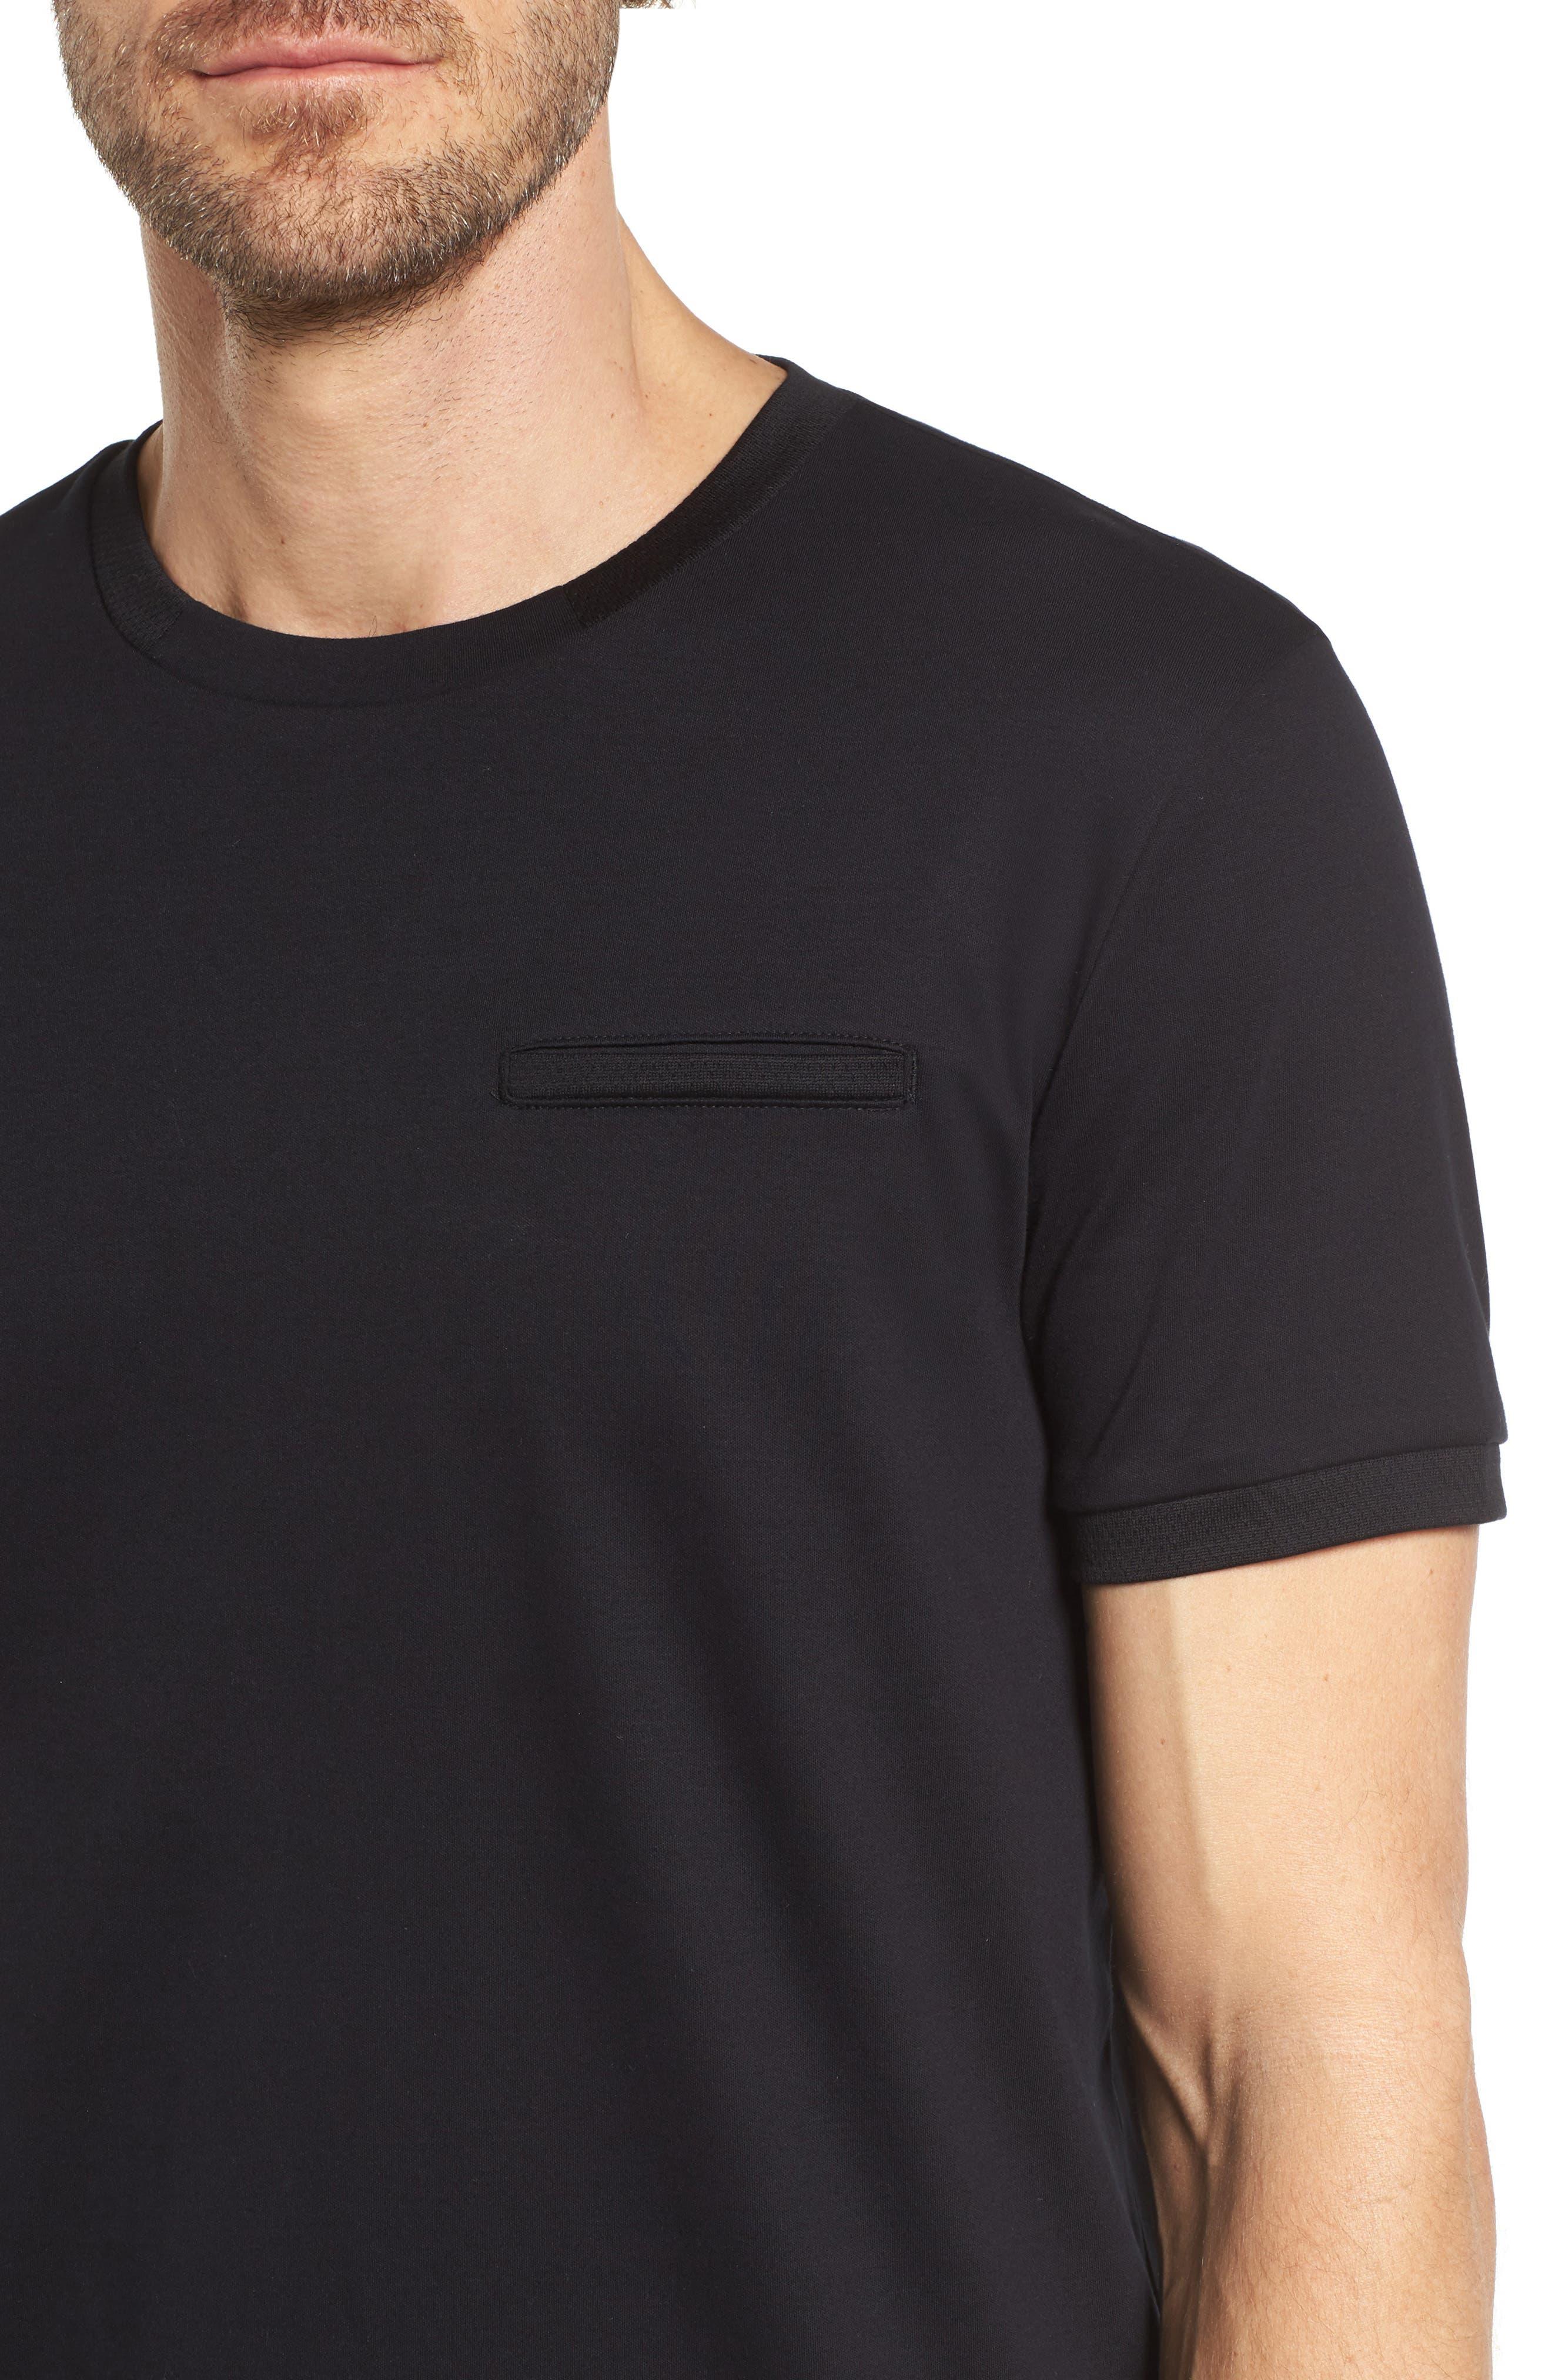 Tessler Mercedes Slim Fit Crewneck T-Shirt,                             Alternate thumbnail 4, color,                             001